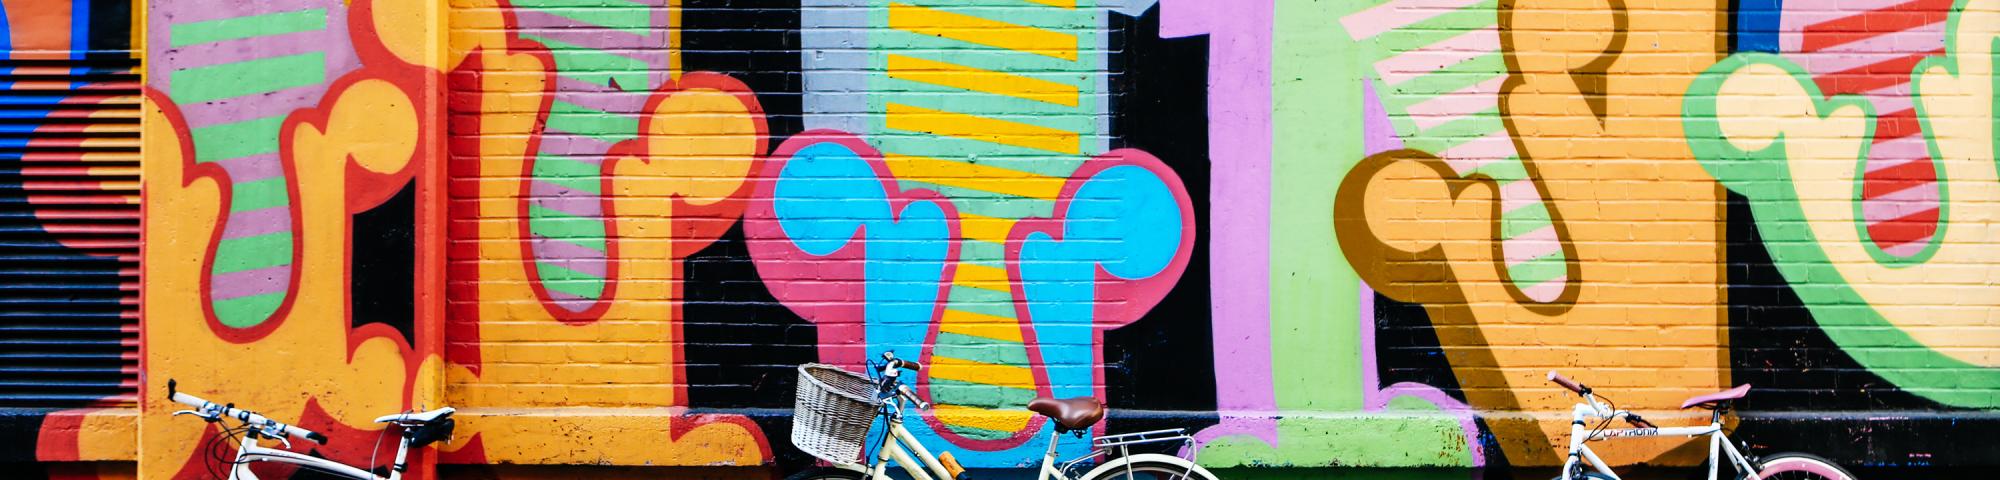 Bikes in front of graffiti